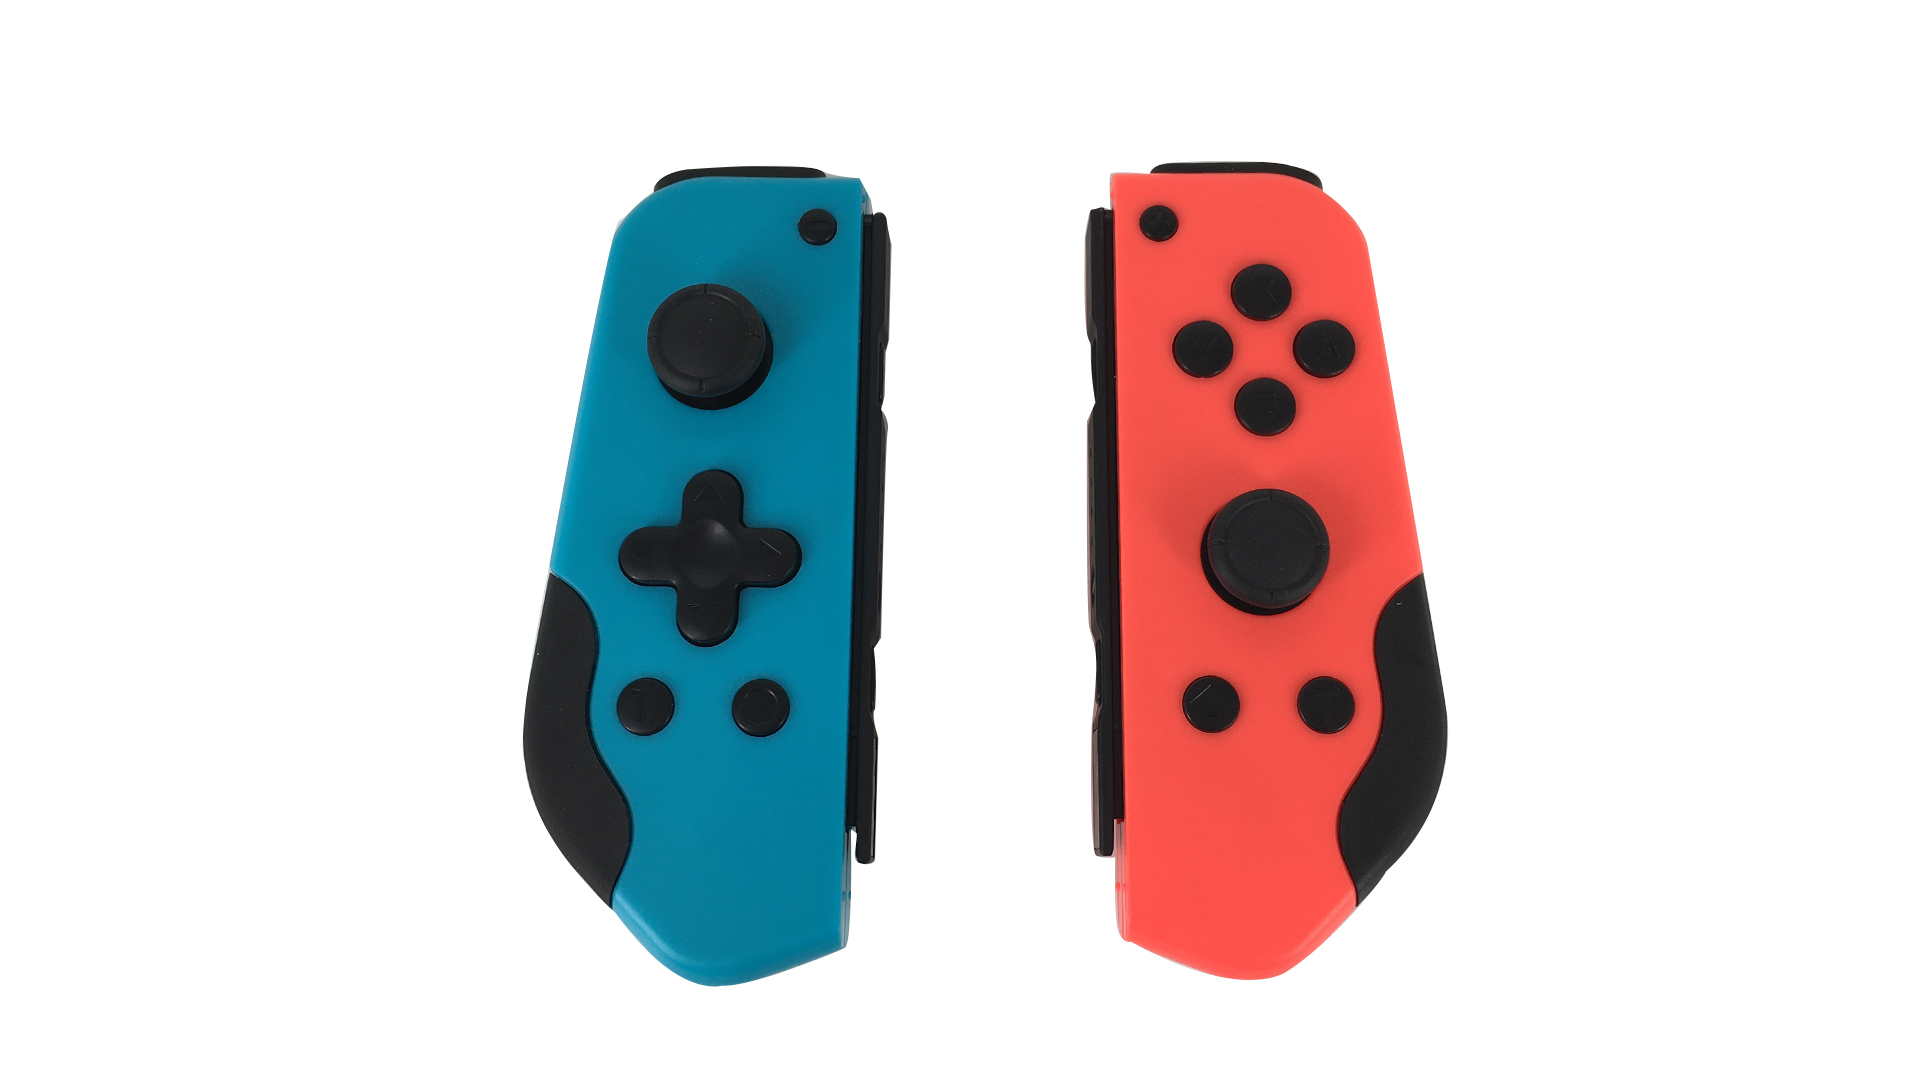 Best Nintendo Switch Wireless Game Controller gioia con con Turbo